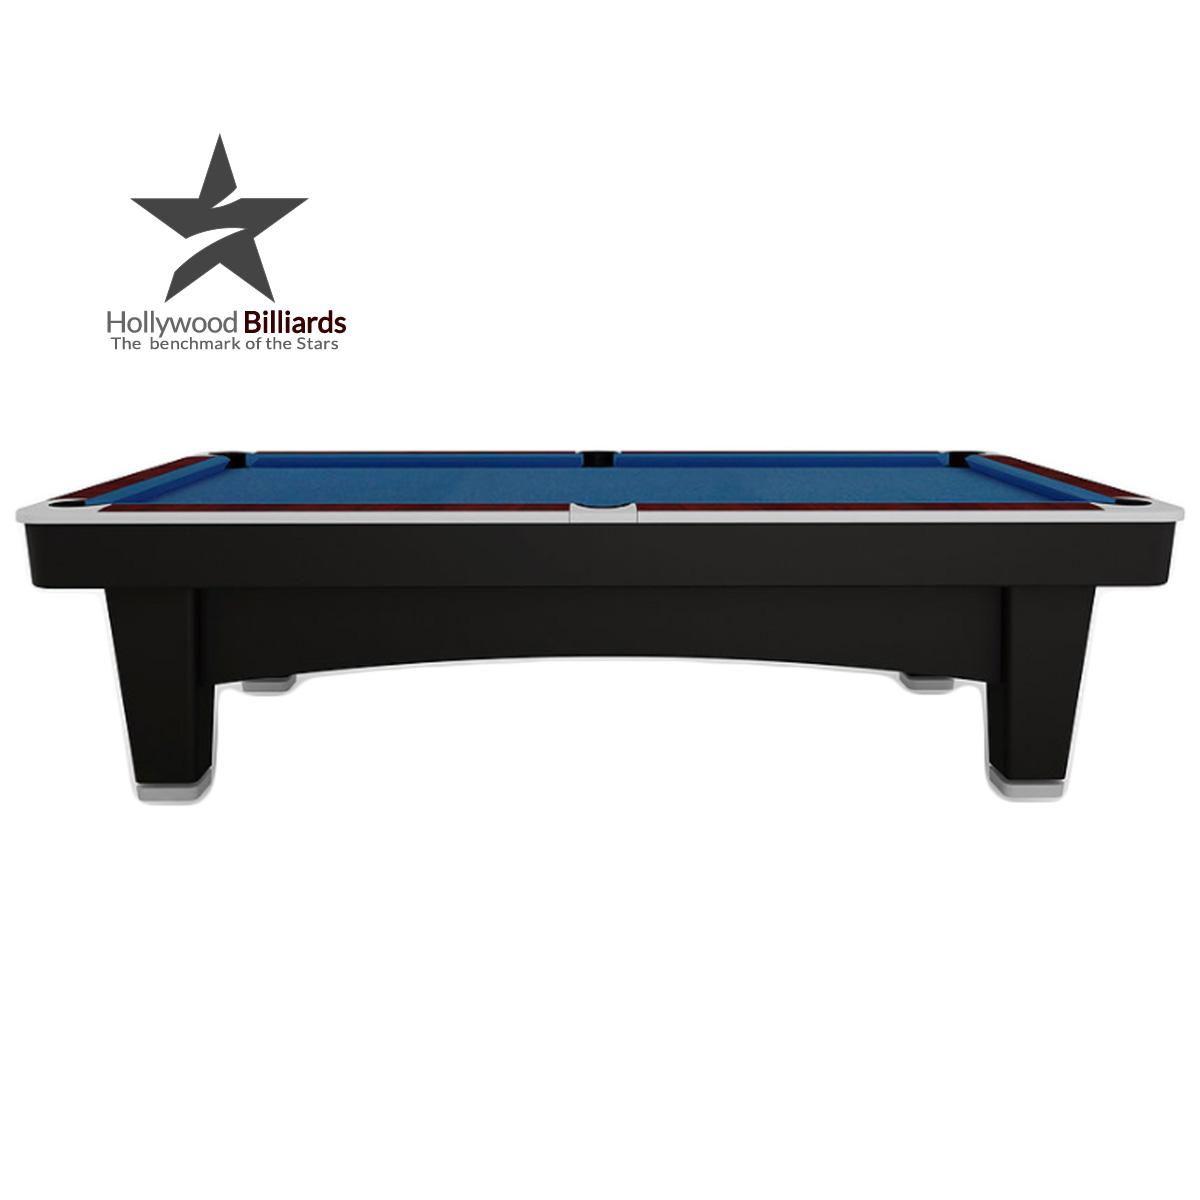 Rasson Pro Innovator Ball Return Commercial Pool Table